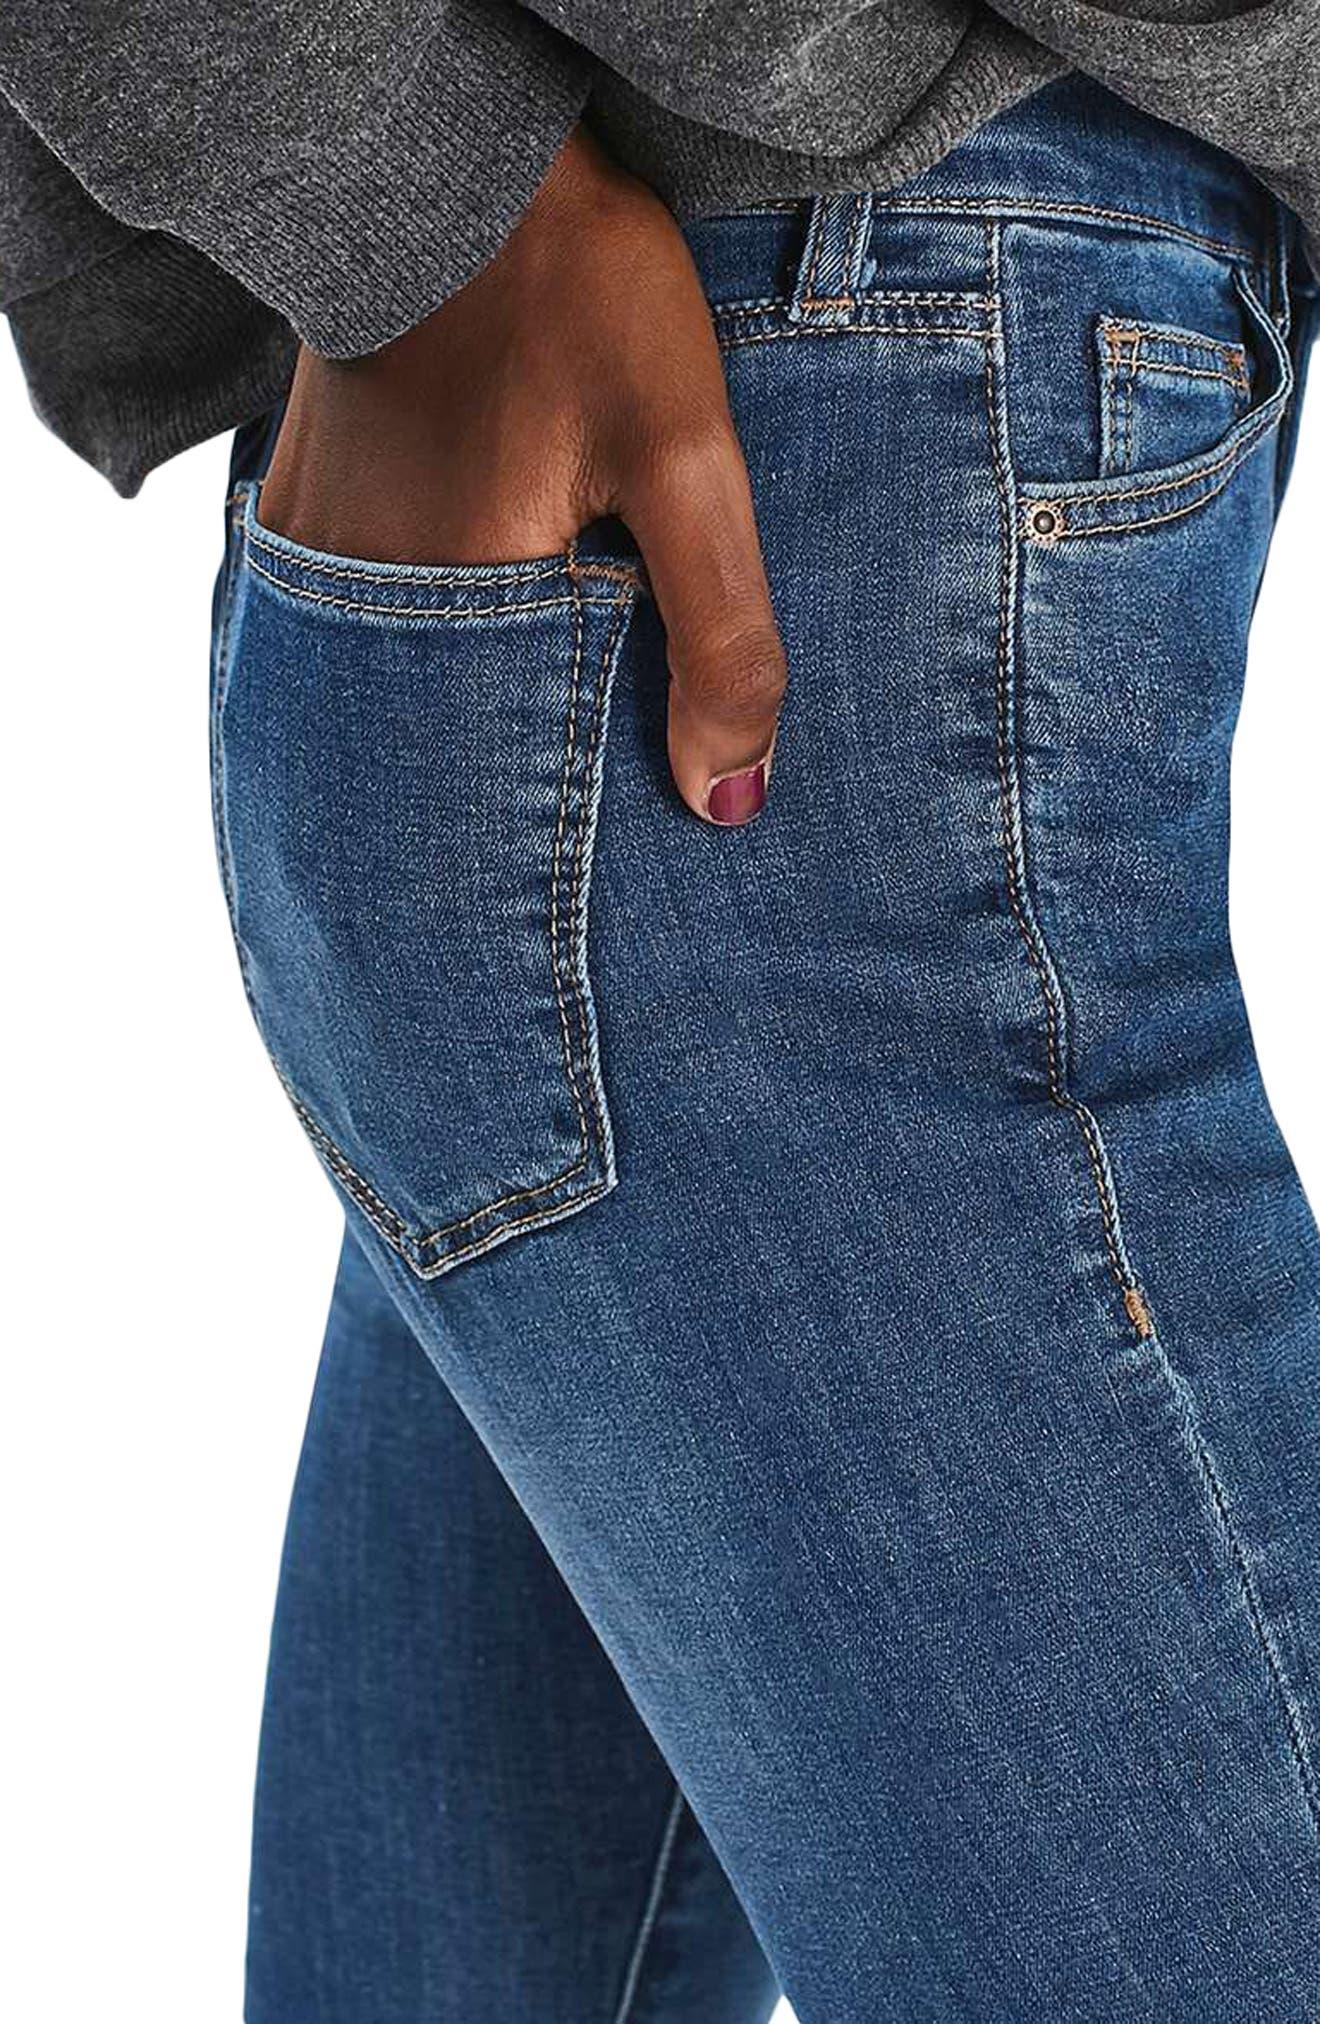 Leigh Skinny Jeans,                             Alternate thumbnail 3, color,                             Mid Denim